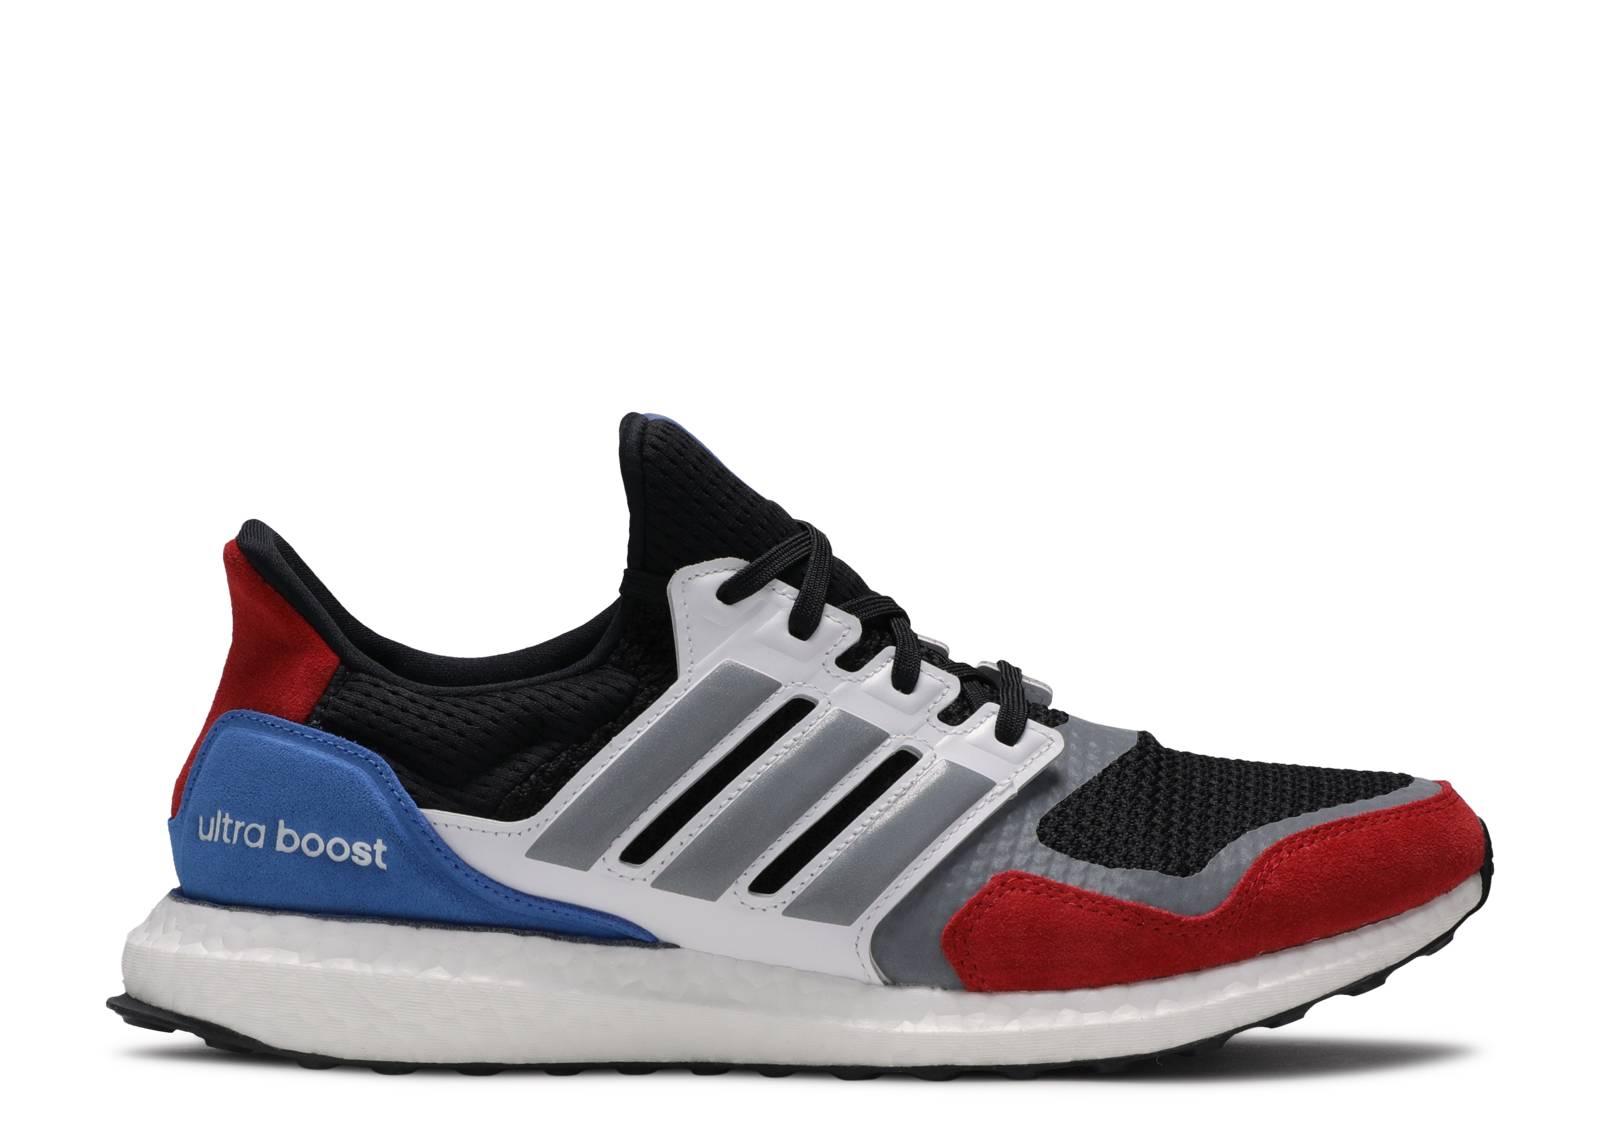 gusano Avanzado Maniobra  UltraBoost 1.0 S&L 'Black Red Blue' - Adidas - EF1360 - core black/grey  three/cloud white | Flight Club